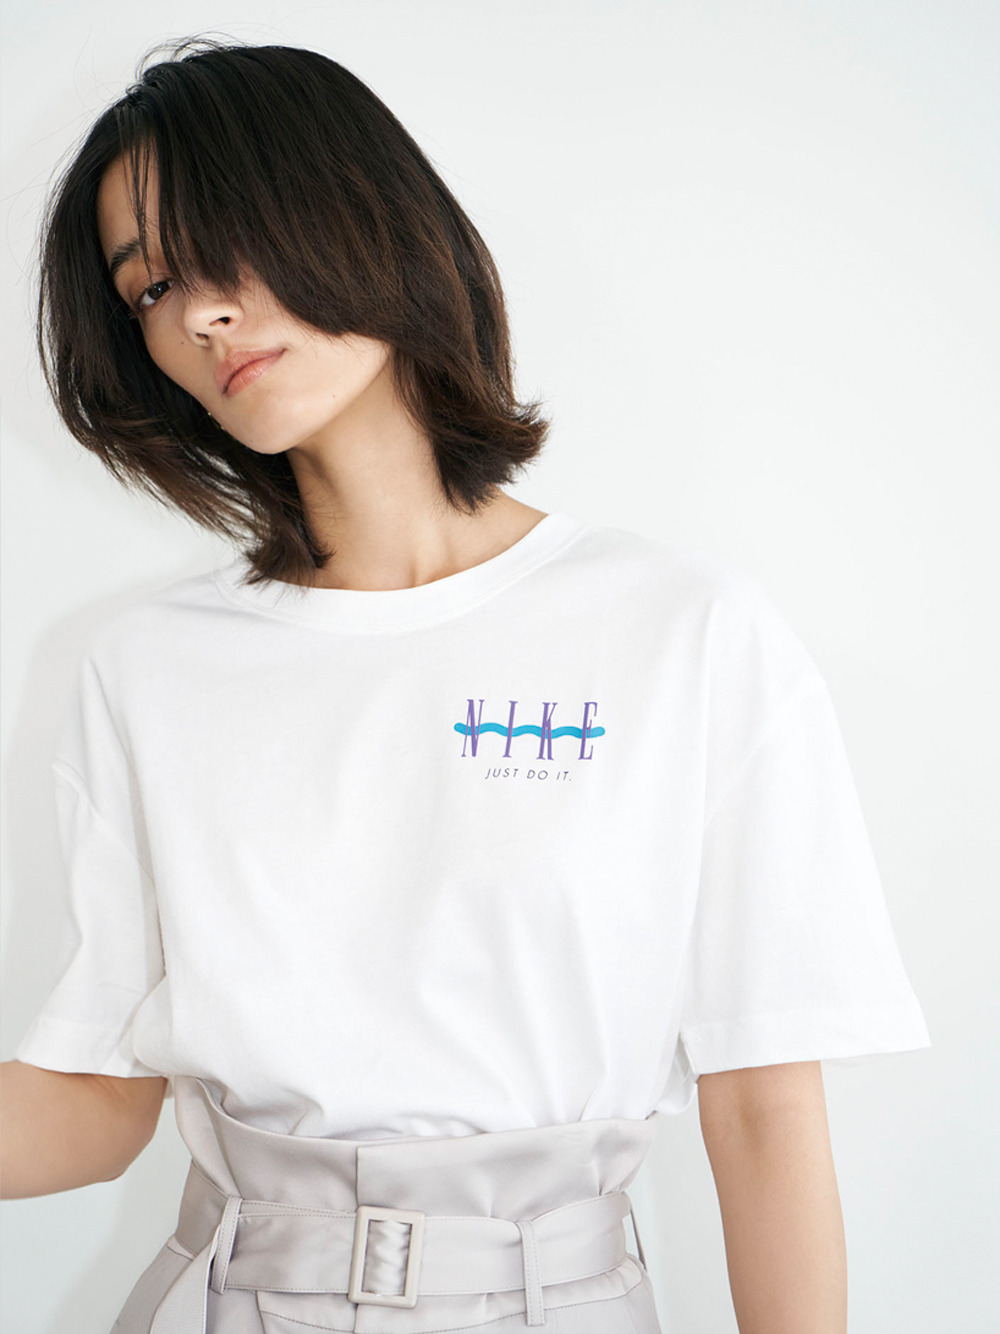 【NIKE】NSW ボーイ ヴィンテージ S/S Tシャツ(WHT-S)